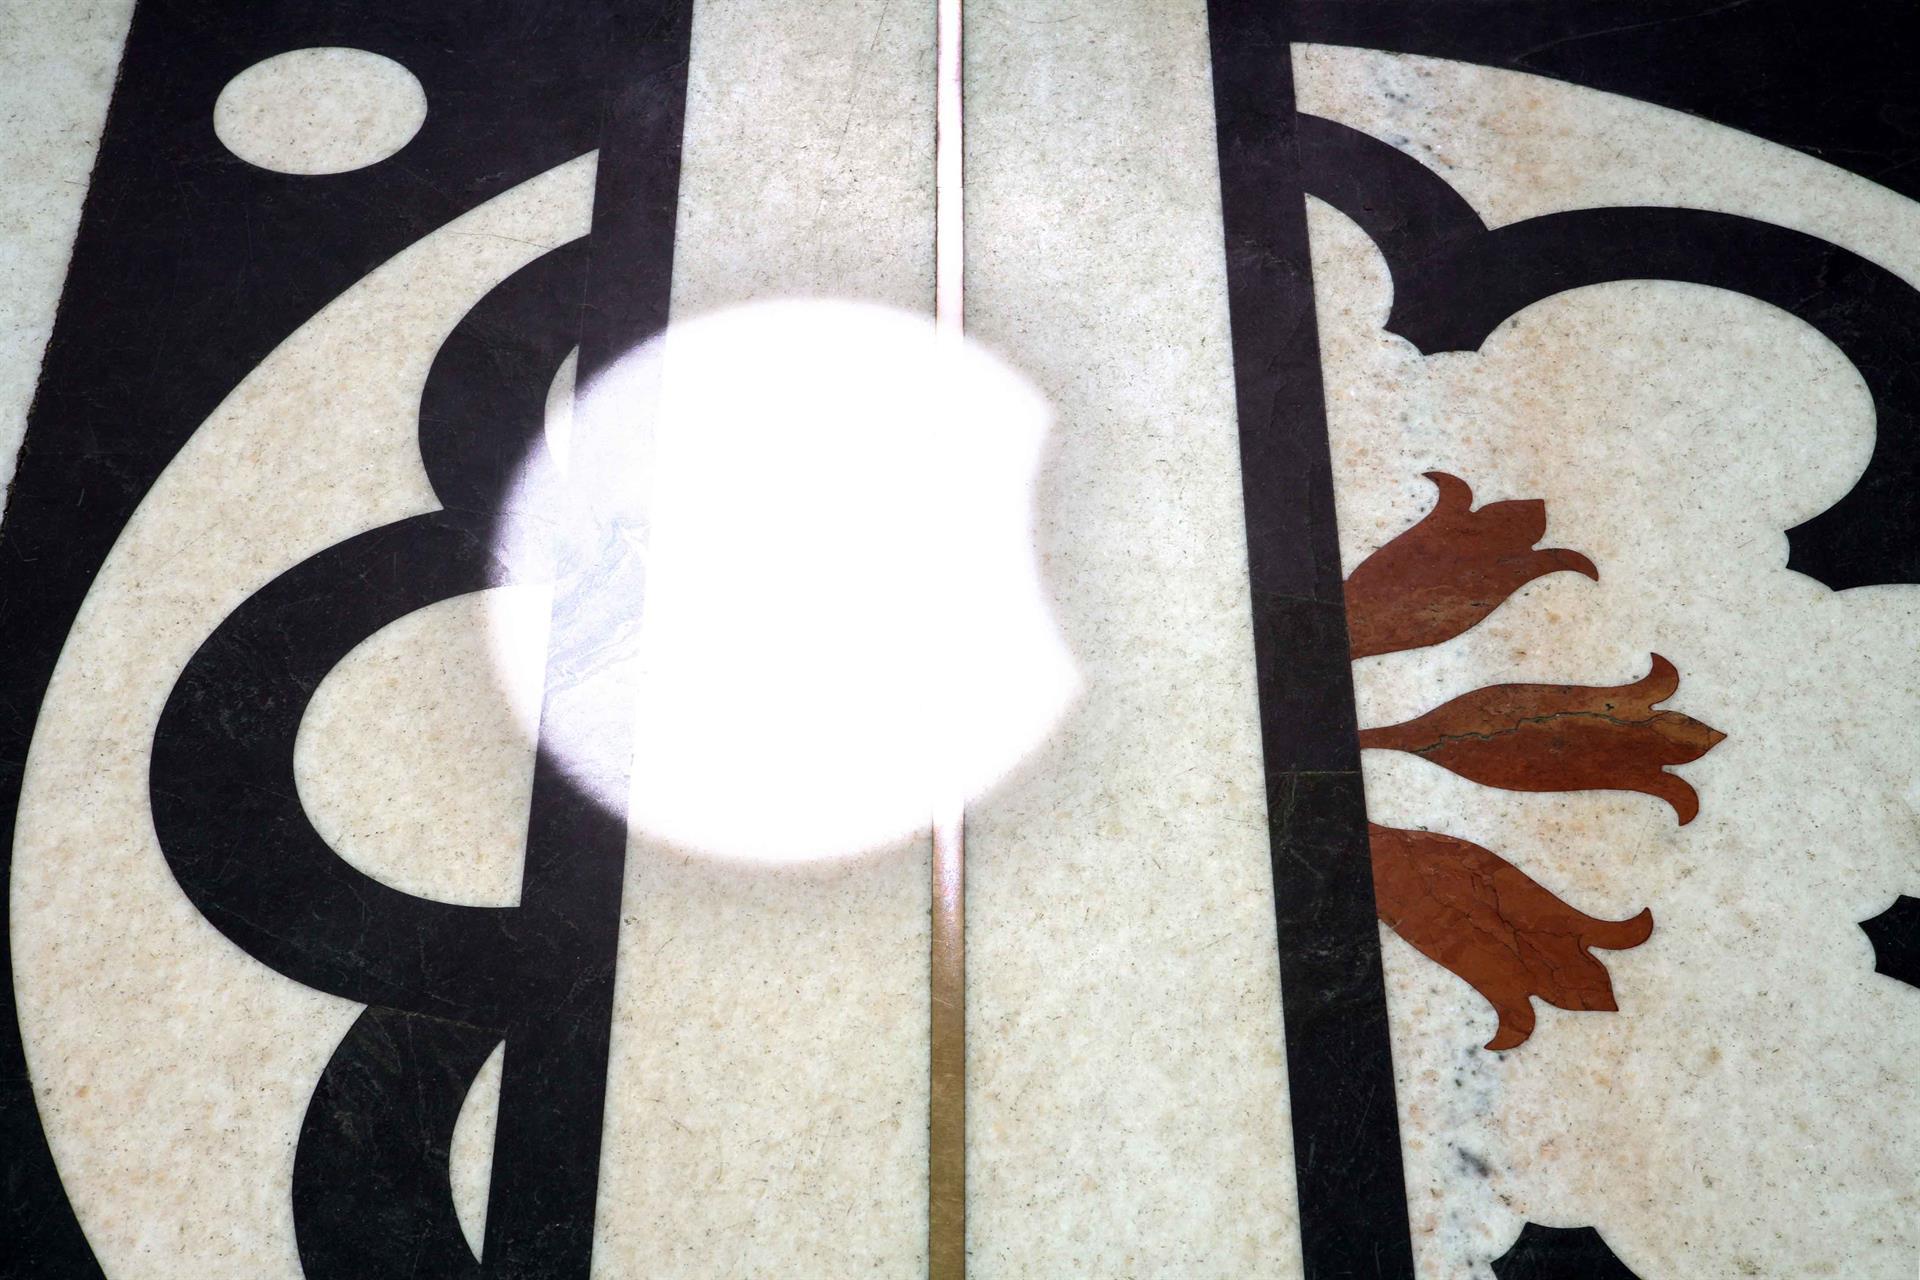 Meridiana - eclissi